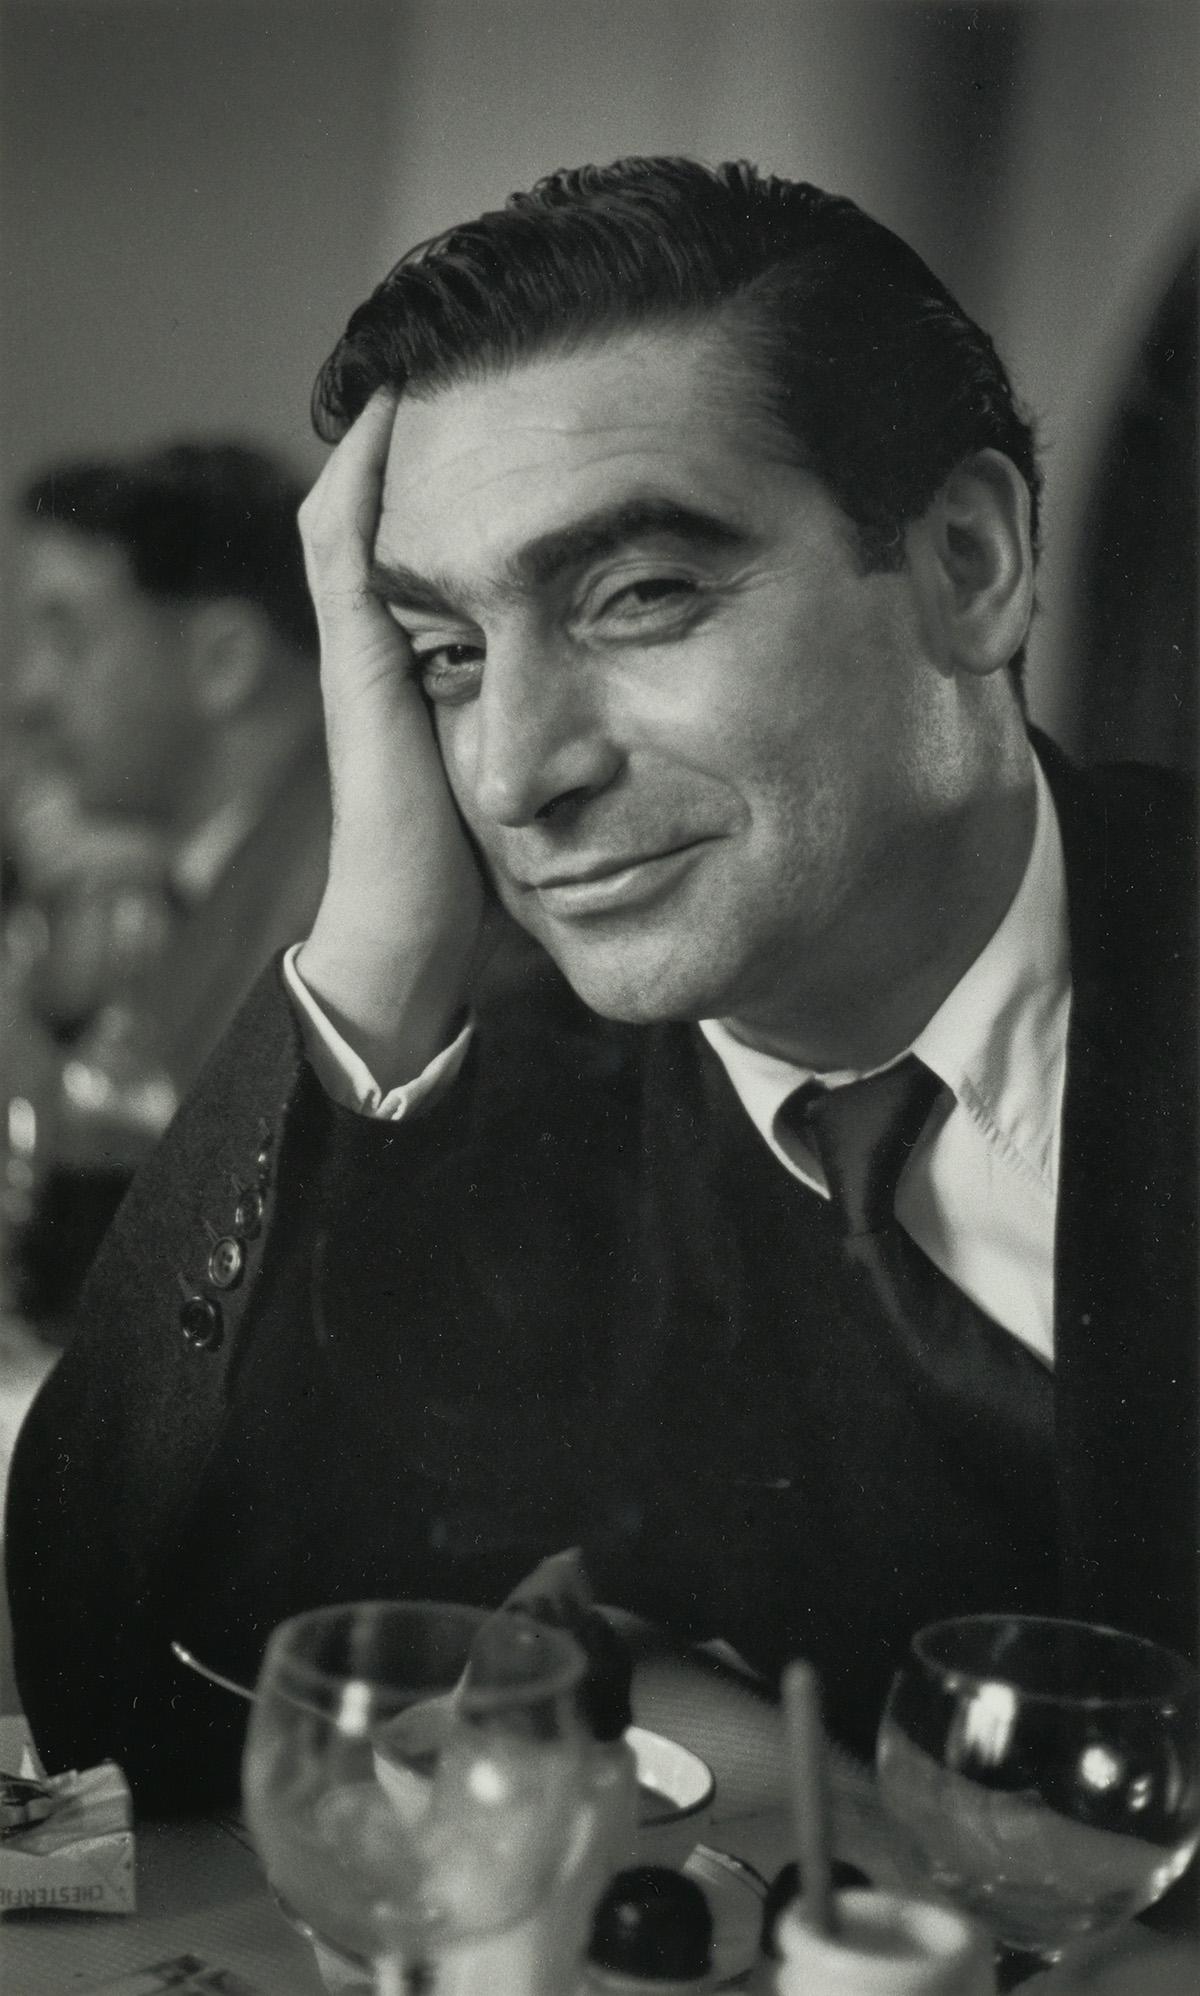 RUTH ORKIN (1921-1985) Robert Capa at Magnum luncheon, Paris.